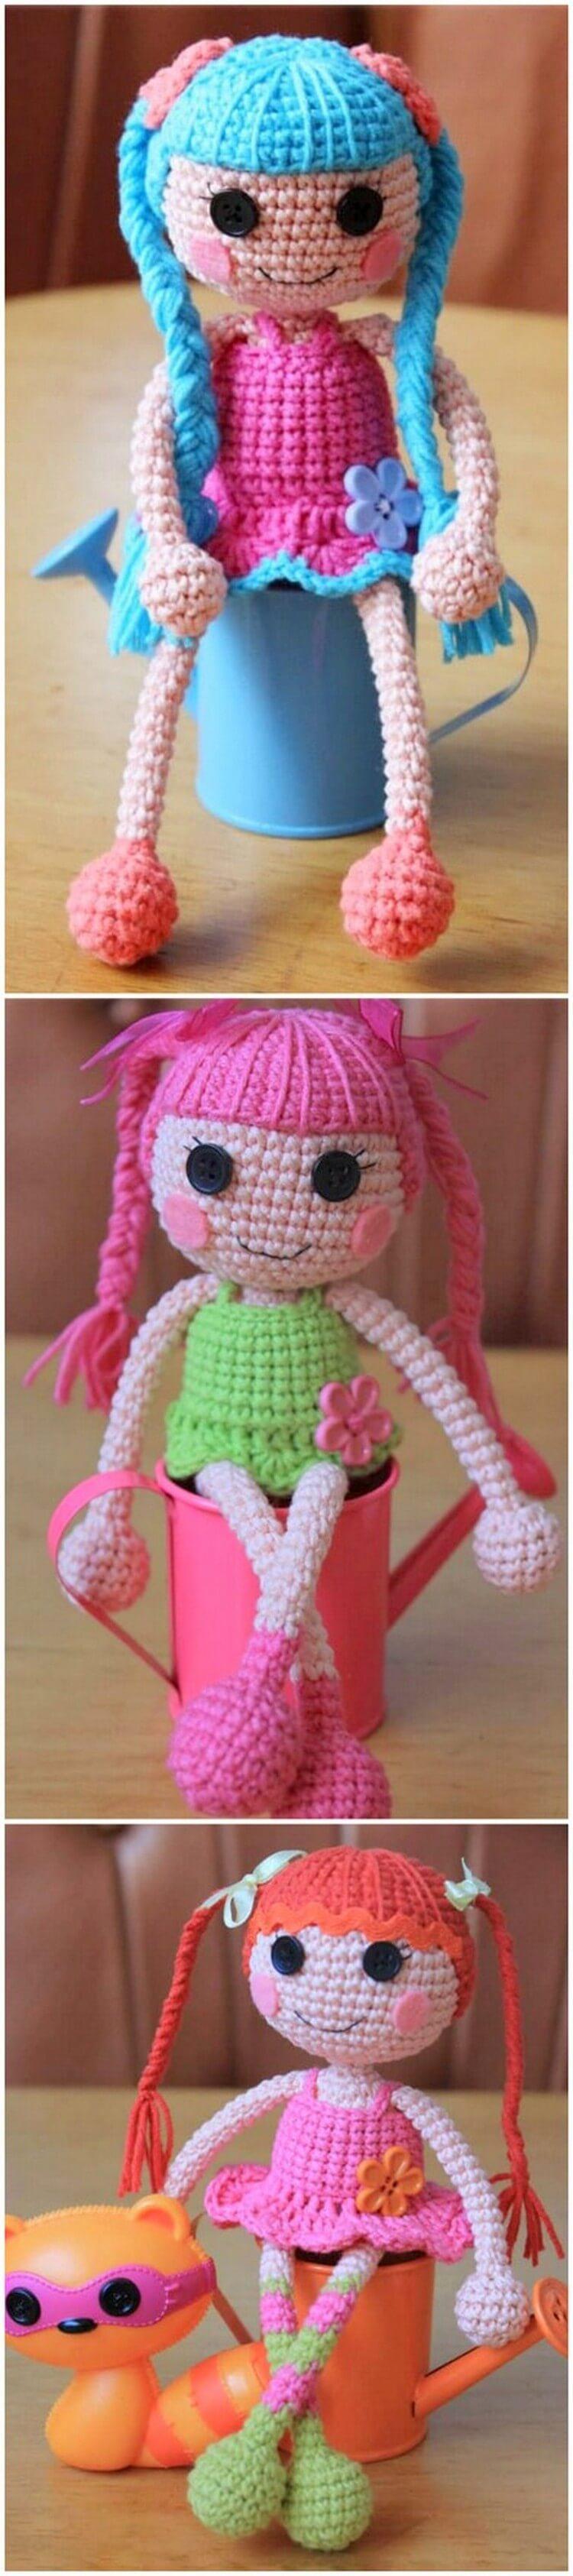 Crochet Amigurumi Pattern (24)